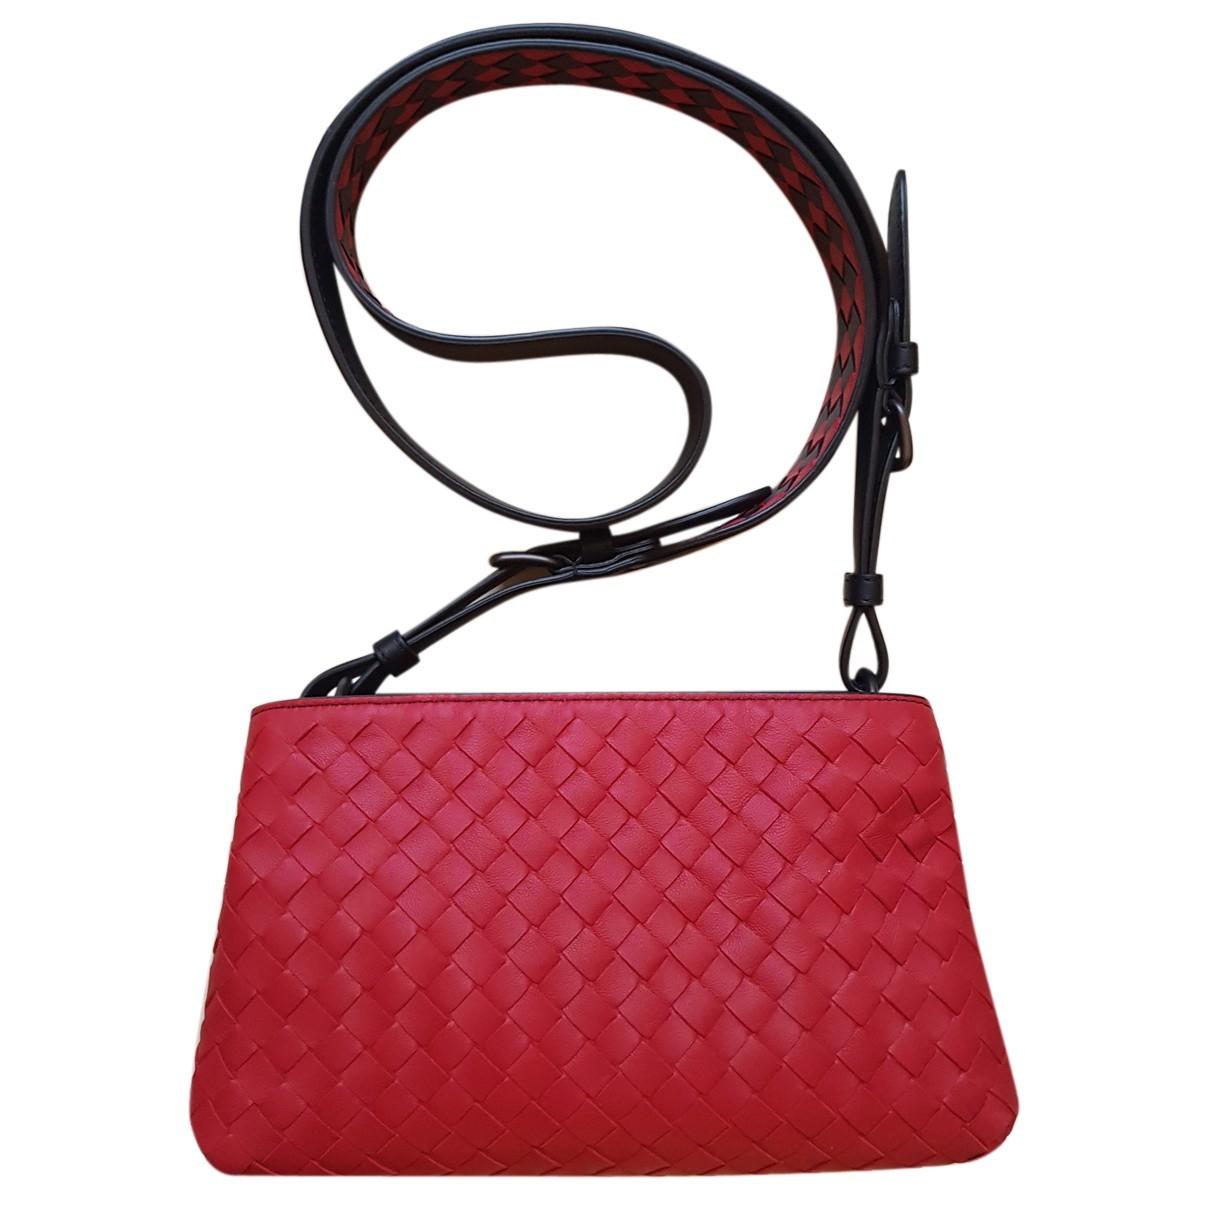 Bottega Veneta - Pochette   pour femme en cuir - rouge